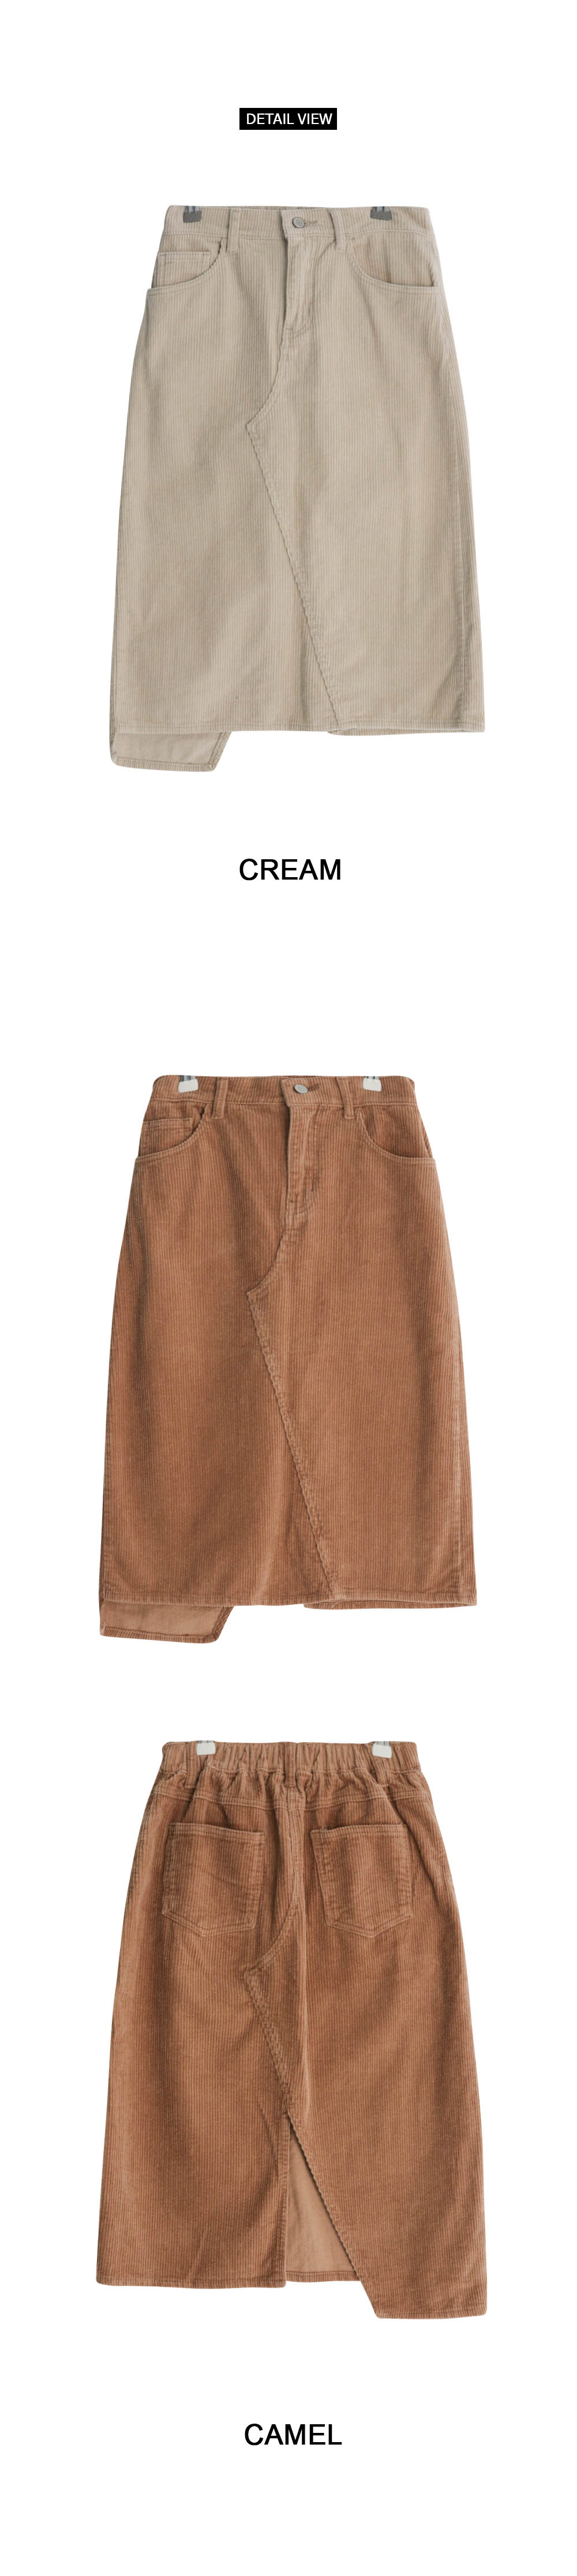 Uneven corduroy long skirt